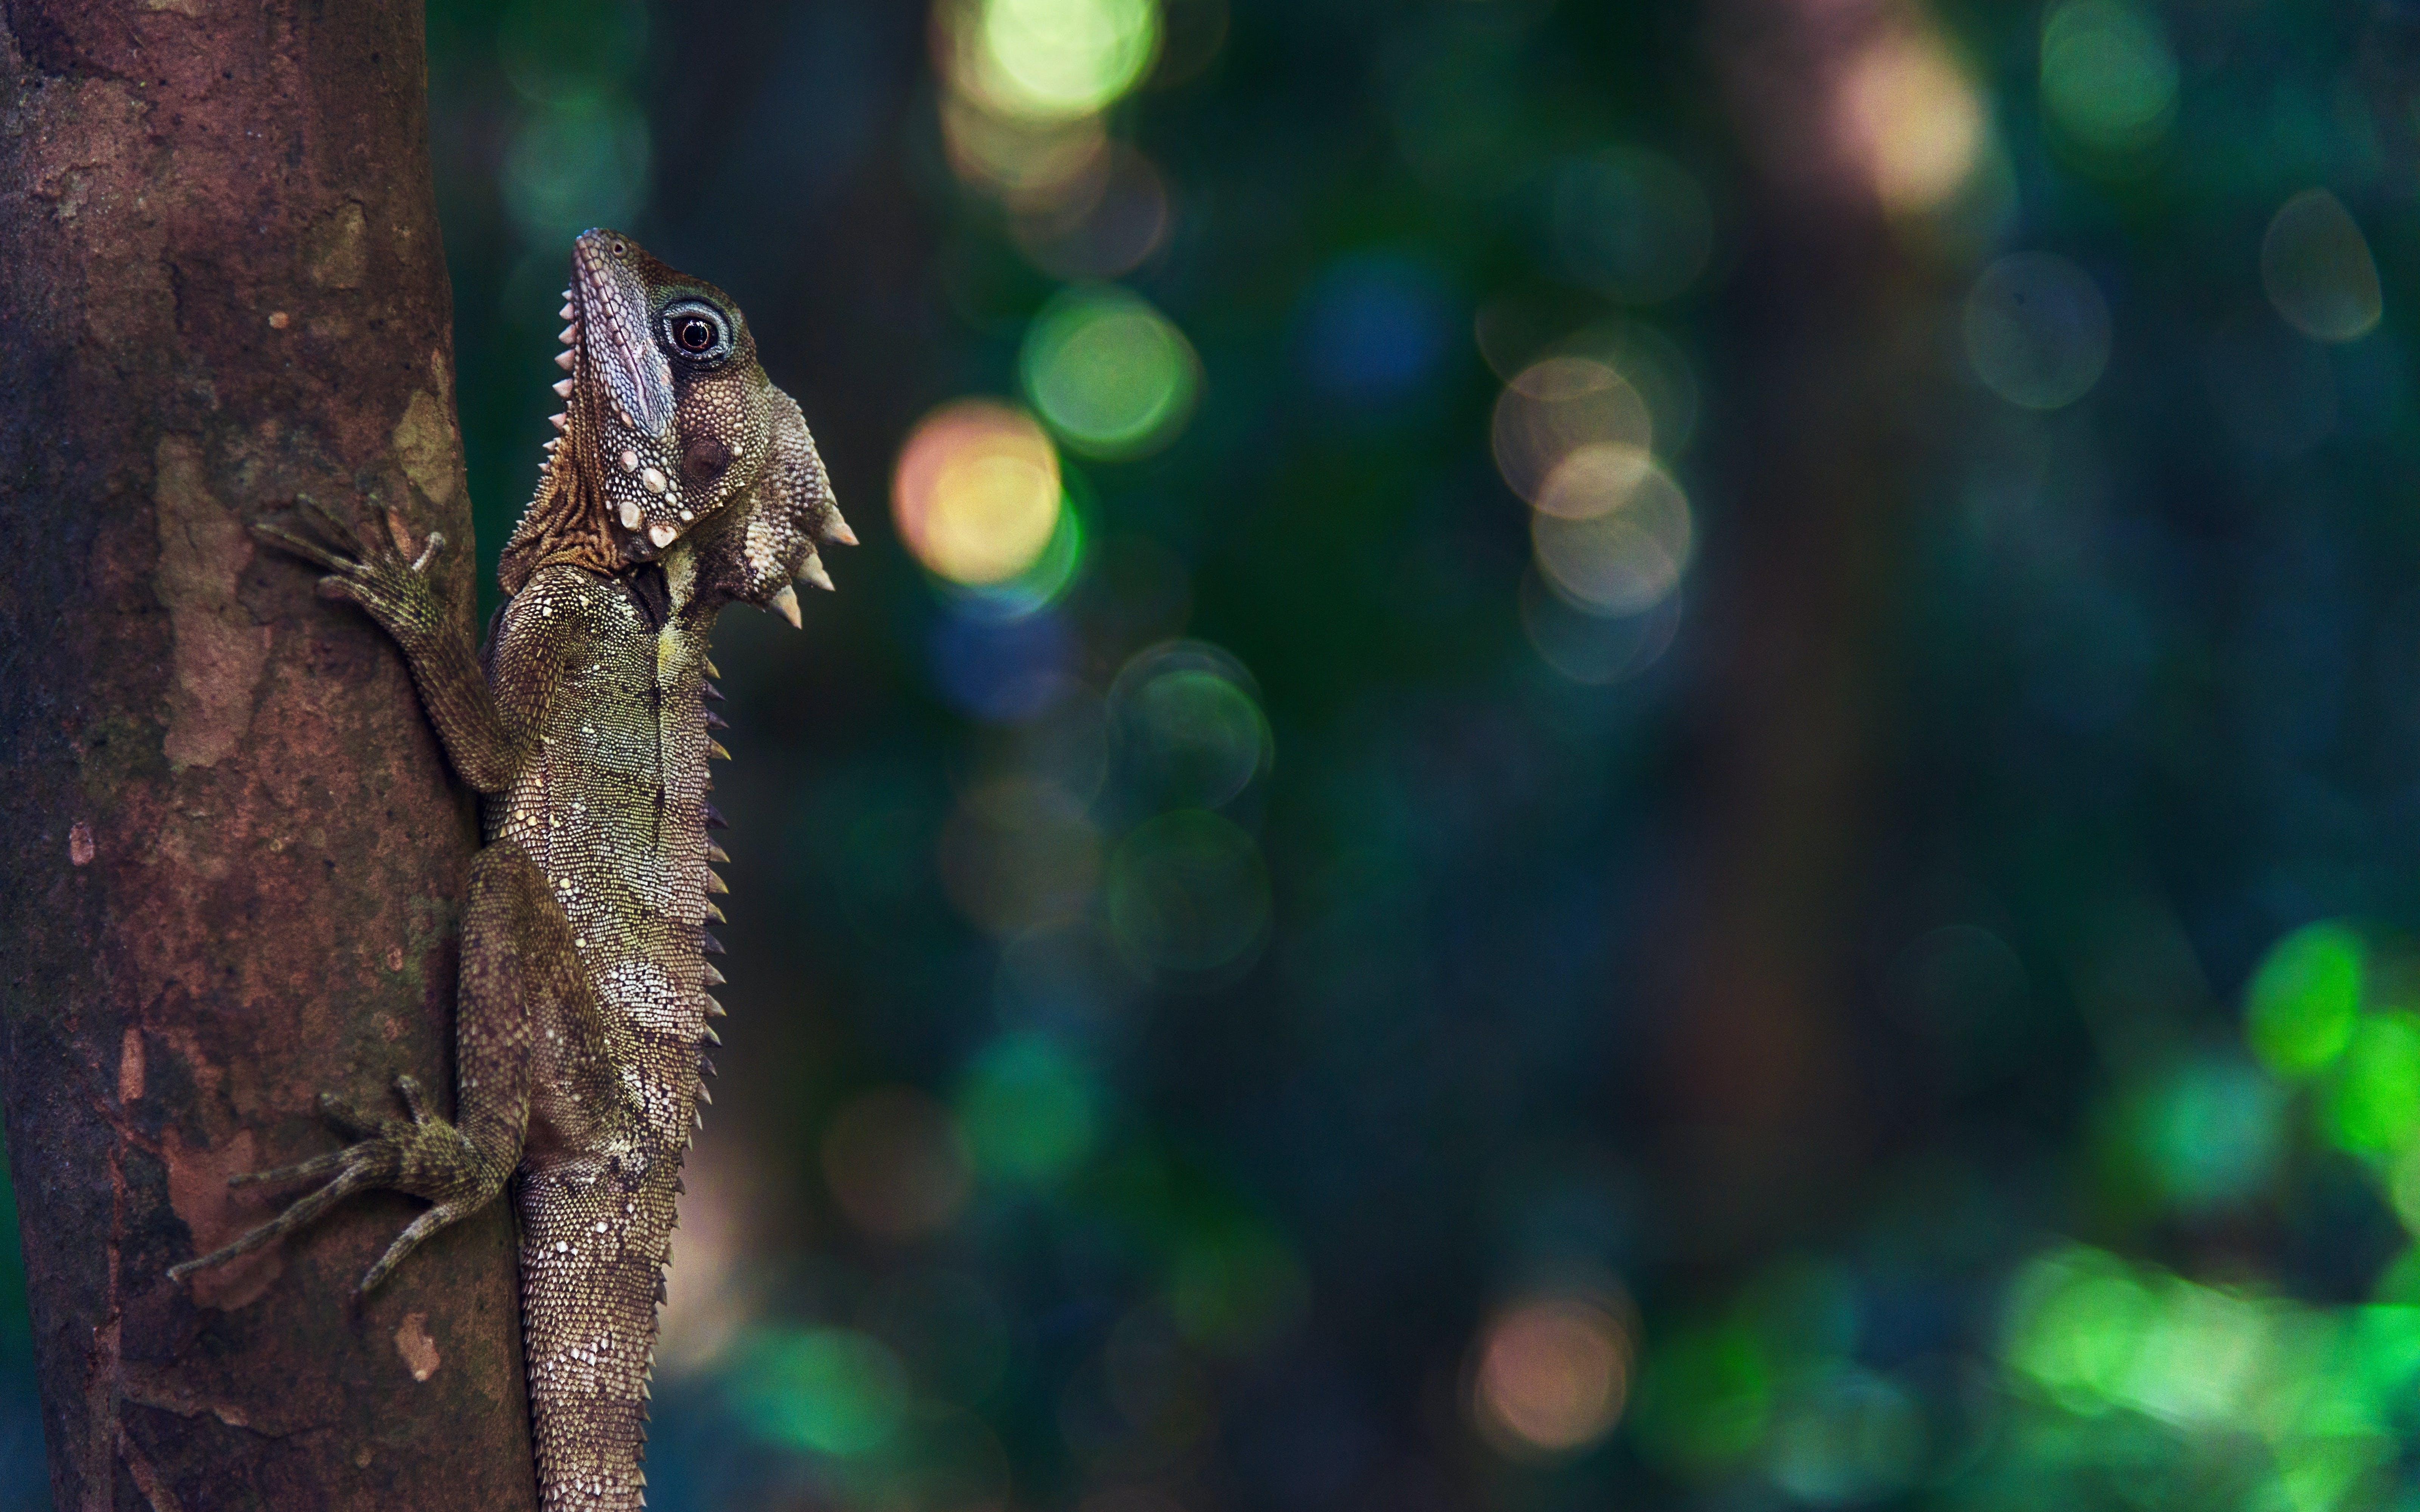 Free stock photo of nature, animals, zoo, lizard